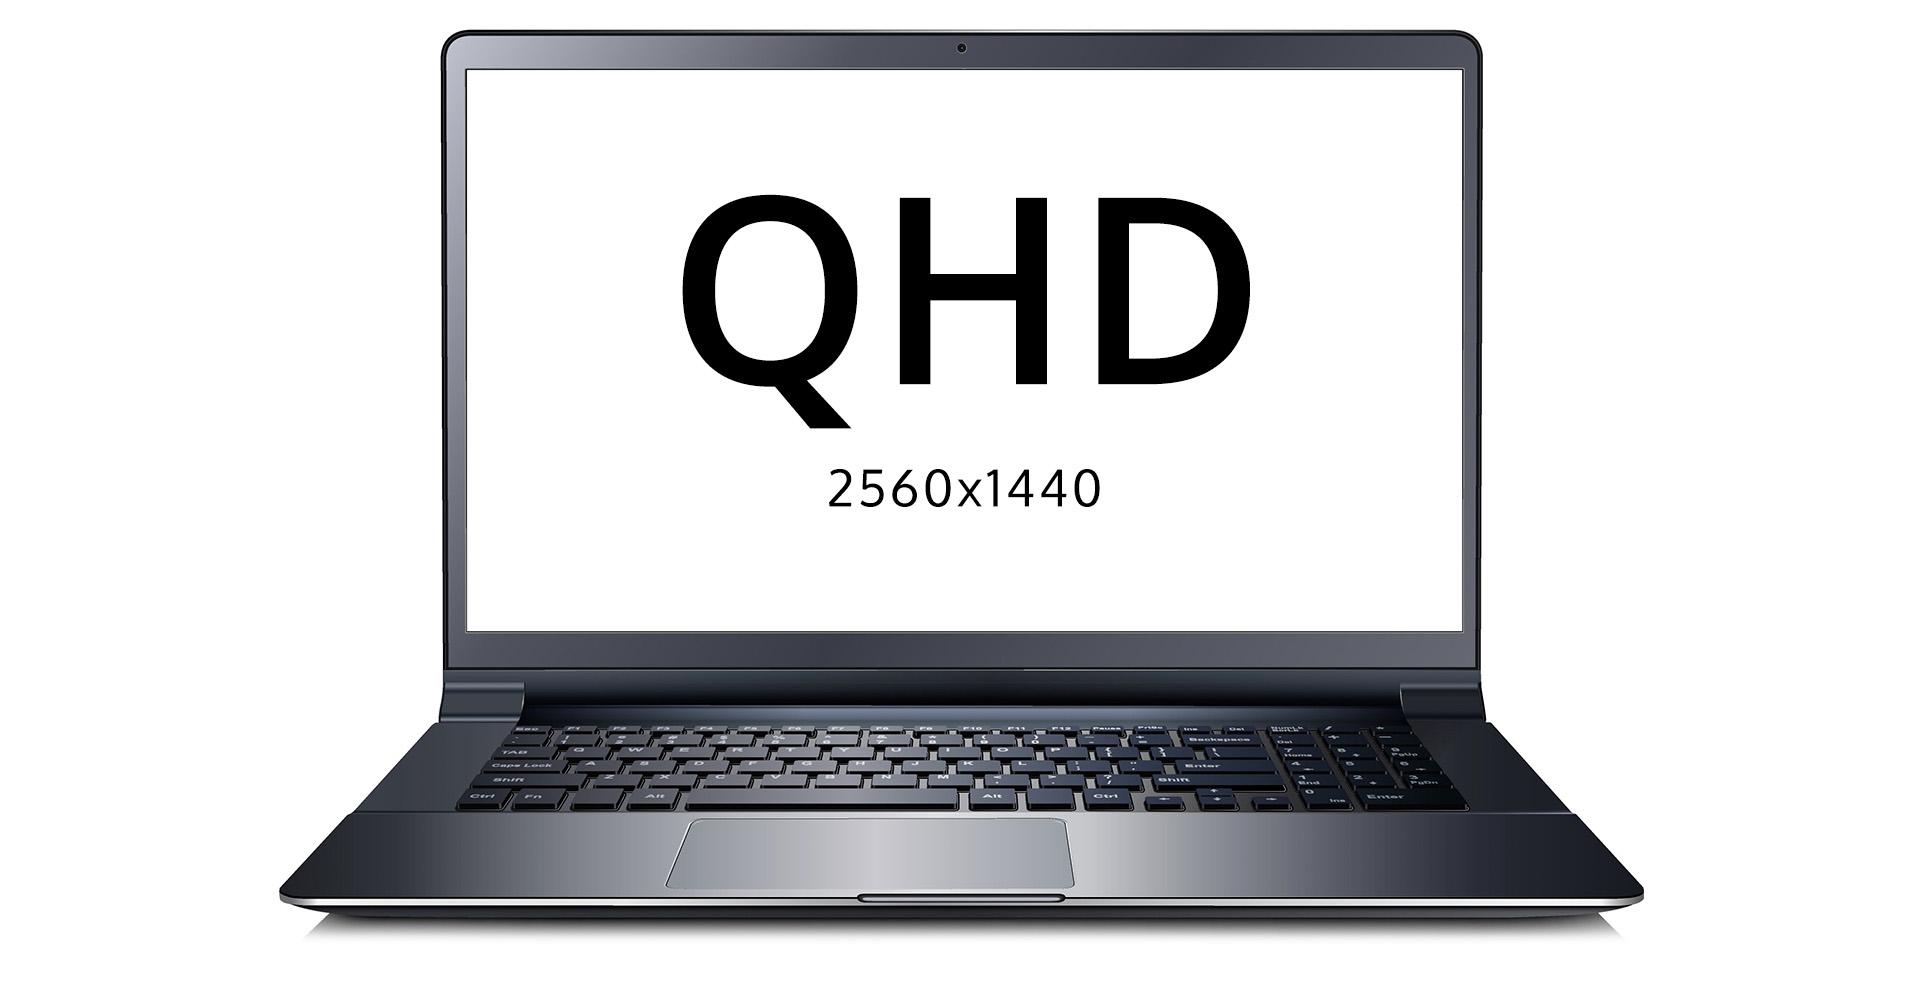 Lenovo 20LD002JPB                             WQHD 2560x1440 resolutsioon